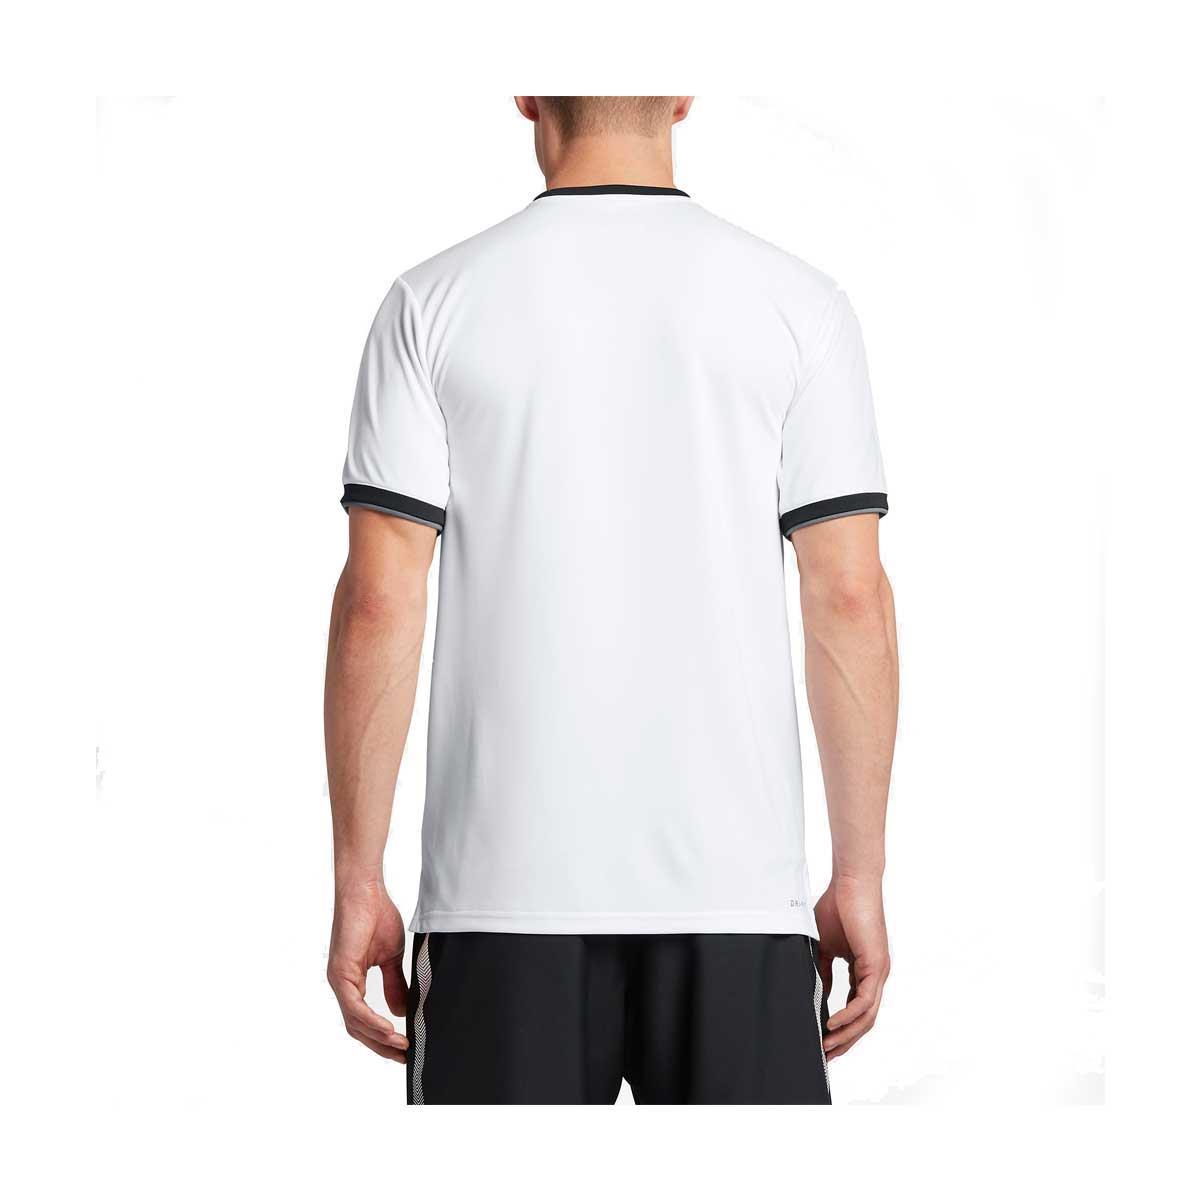 Camiseta de Tênis Nike NikeCourt Dry Top Team Masculino e86ad4d6260a1